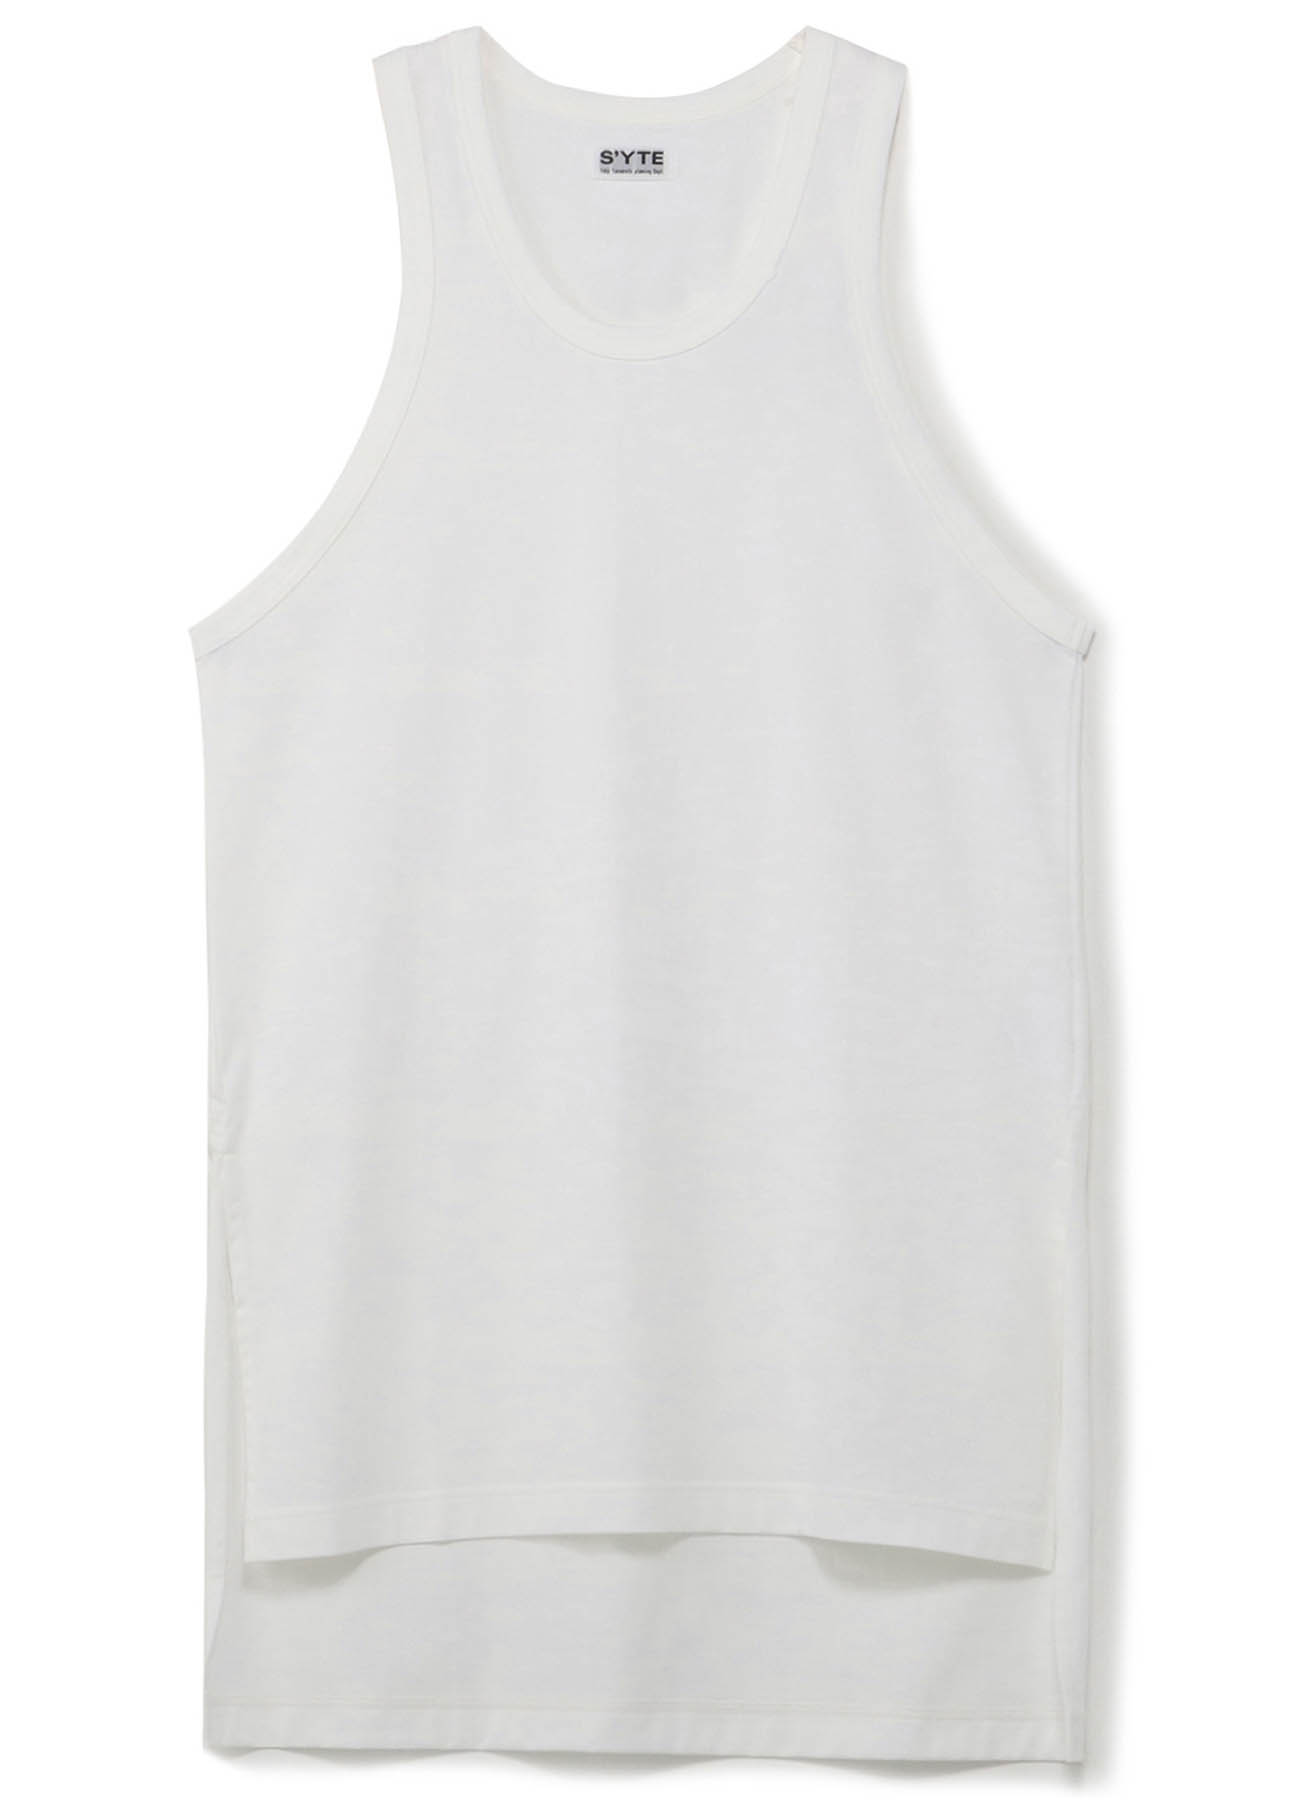 40/2 Cotton Jersey Long Big Tank Top